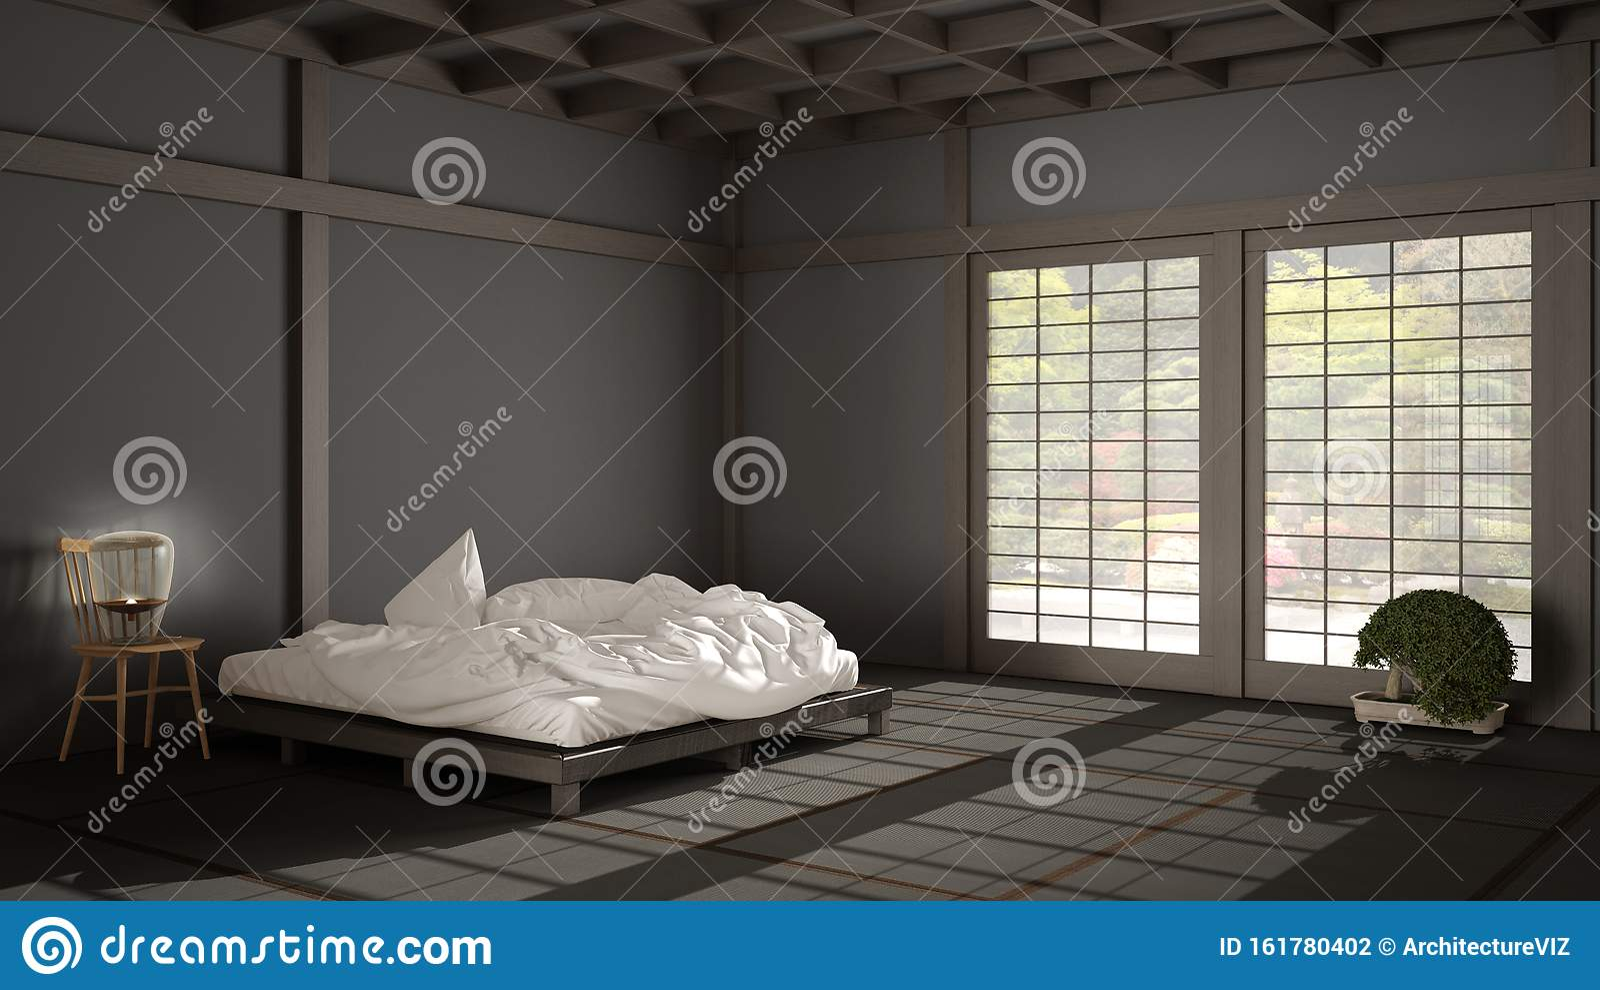 Zen Japanese Empty Minimalist Bedroom Wooden Roof Tatami Floor Futon Double Bed Big Window On Zen Garden Meditative Space Stock Illustration Illustration Of Calm Peace 161780402